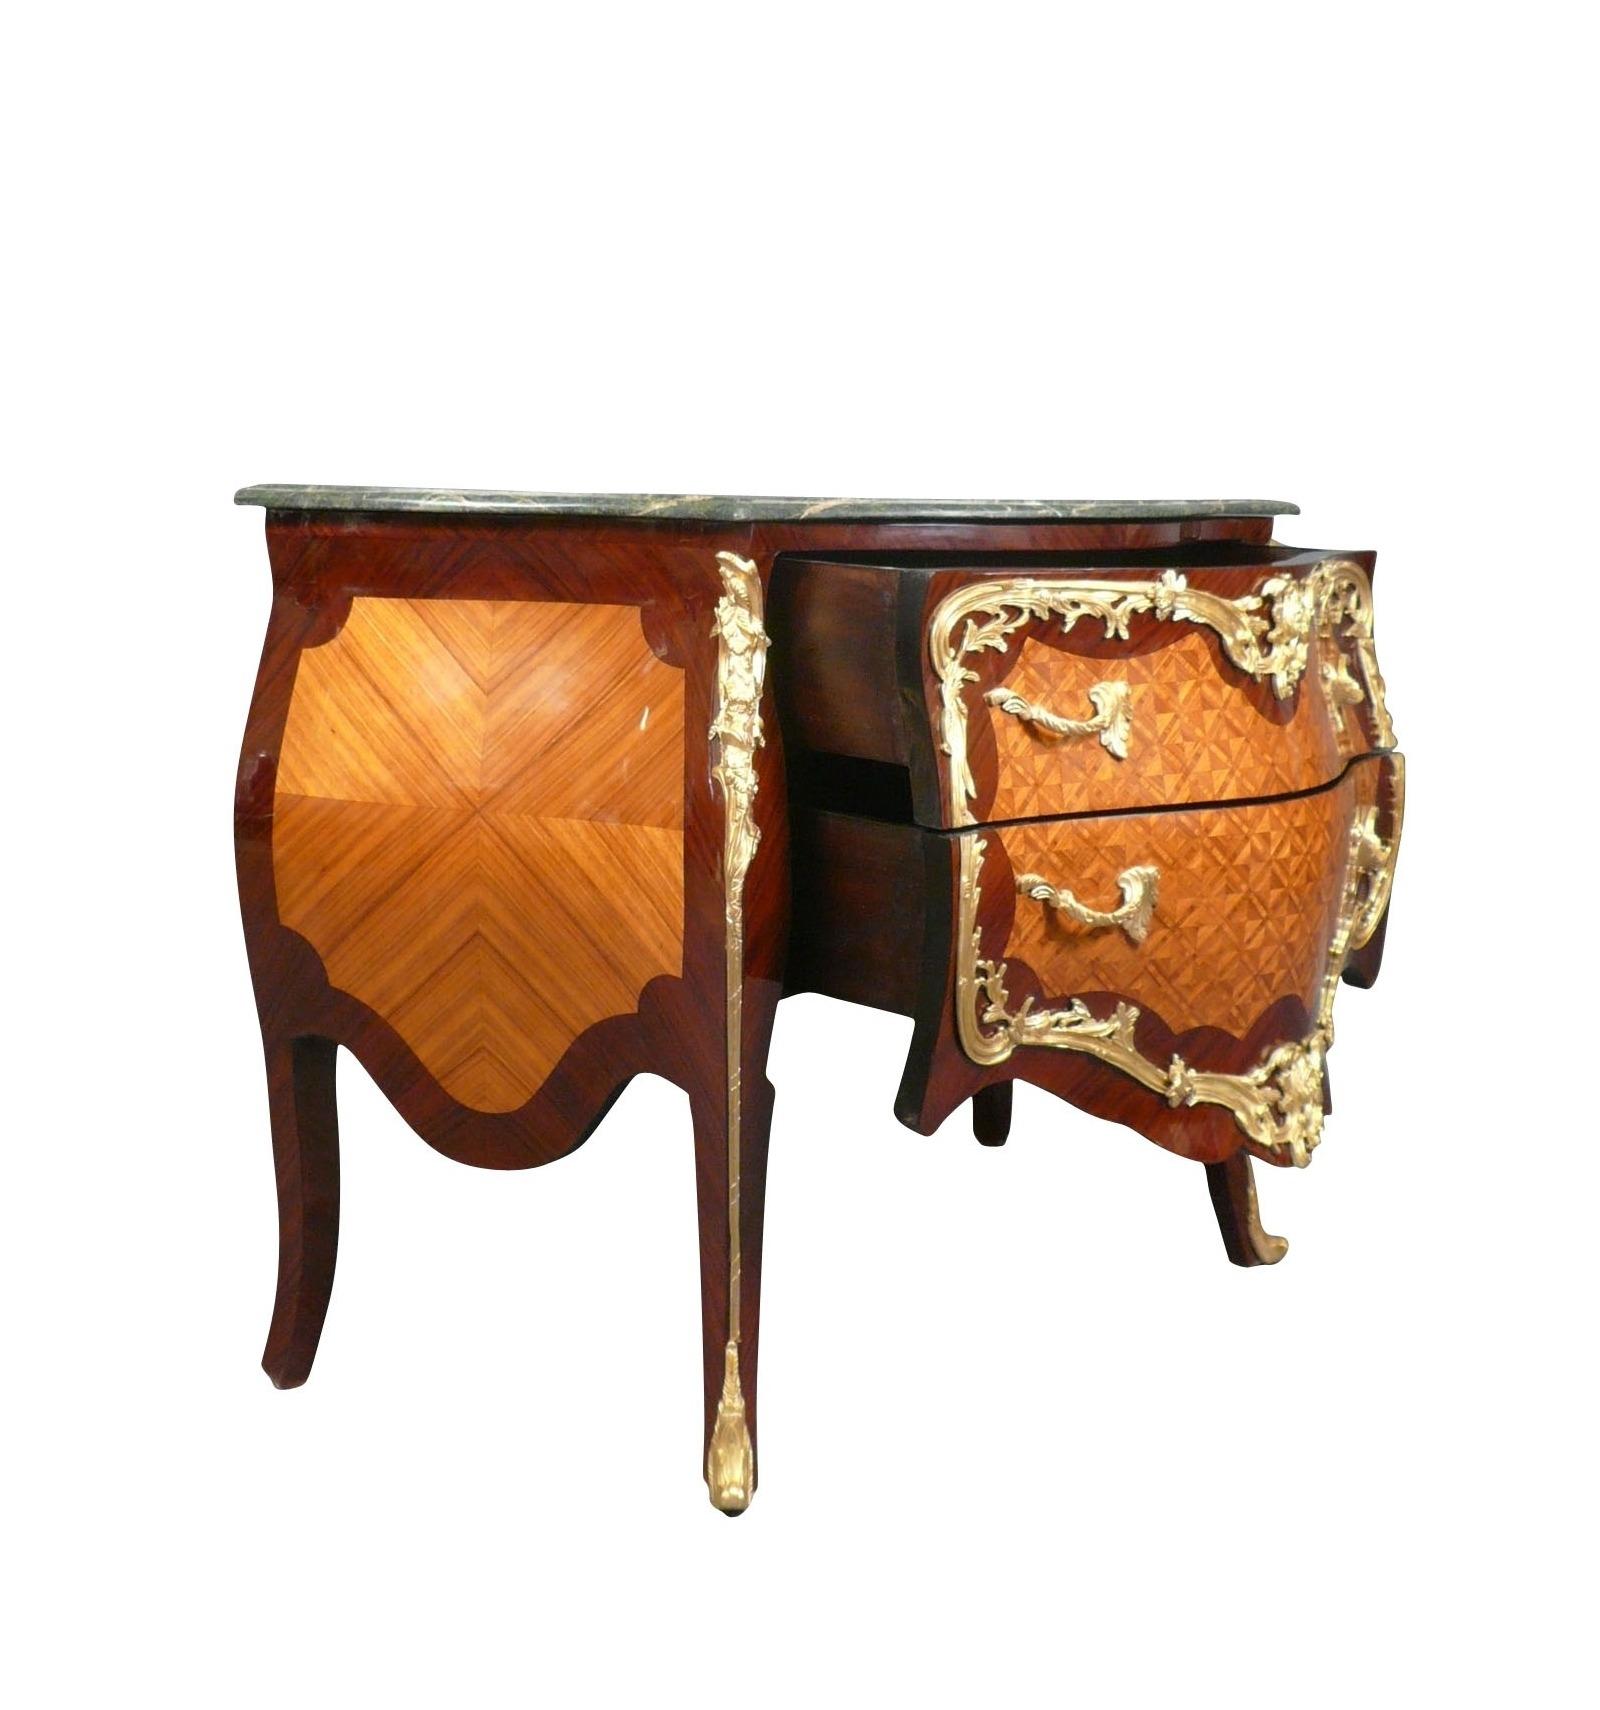 Commode louis xv copie de meuble de style ancien - Meuble de style louis xv ...